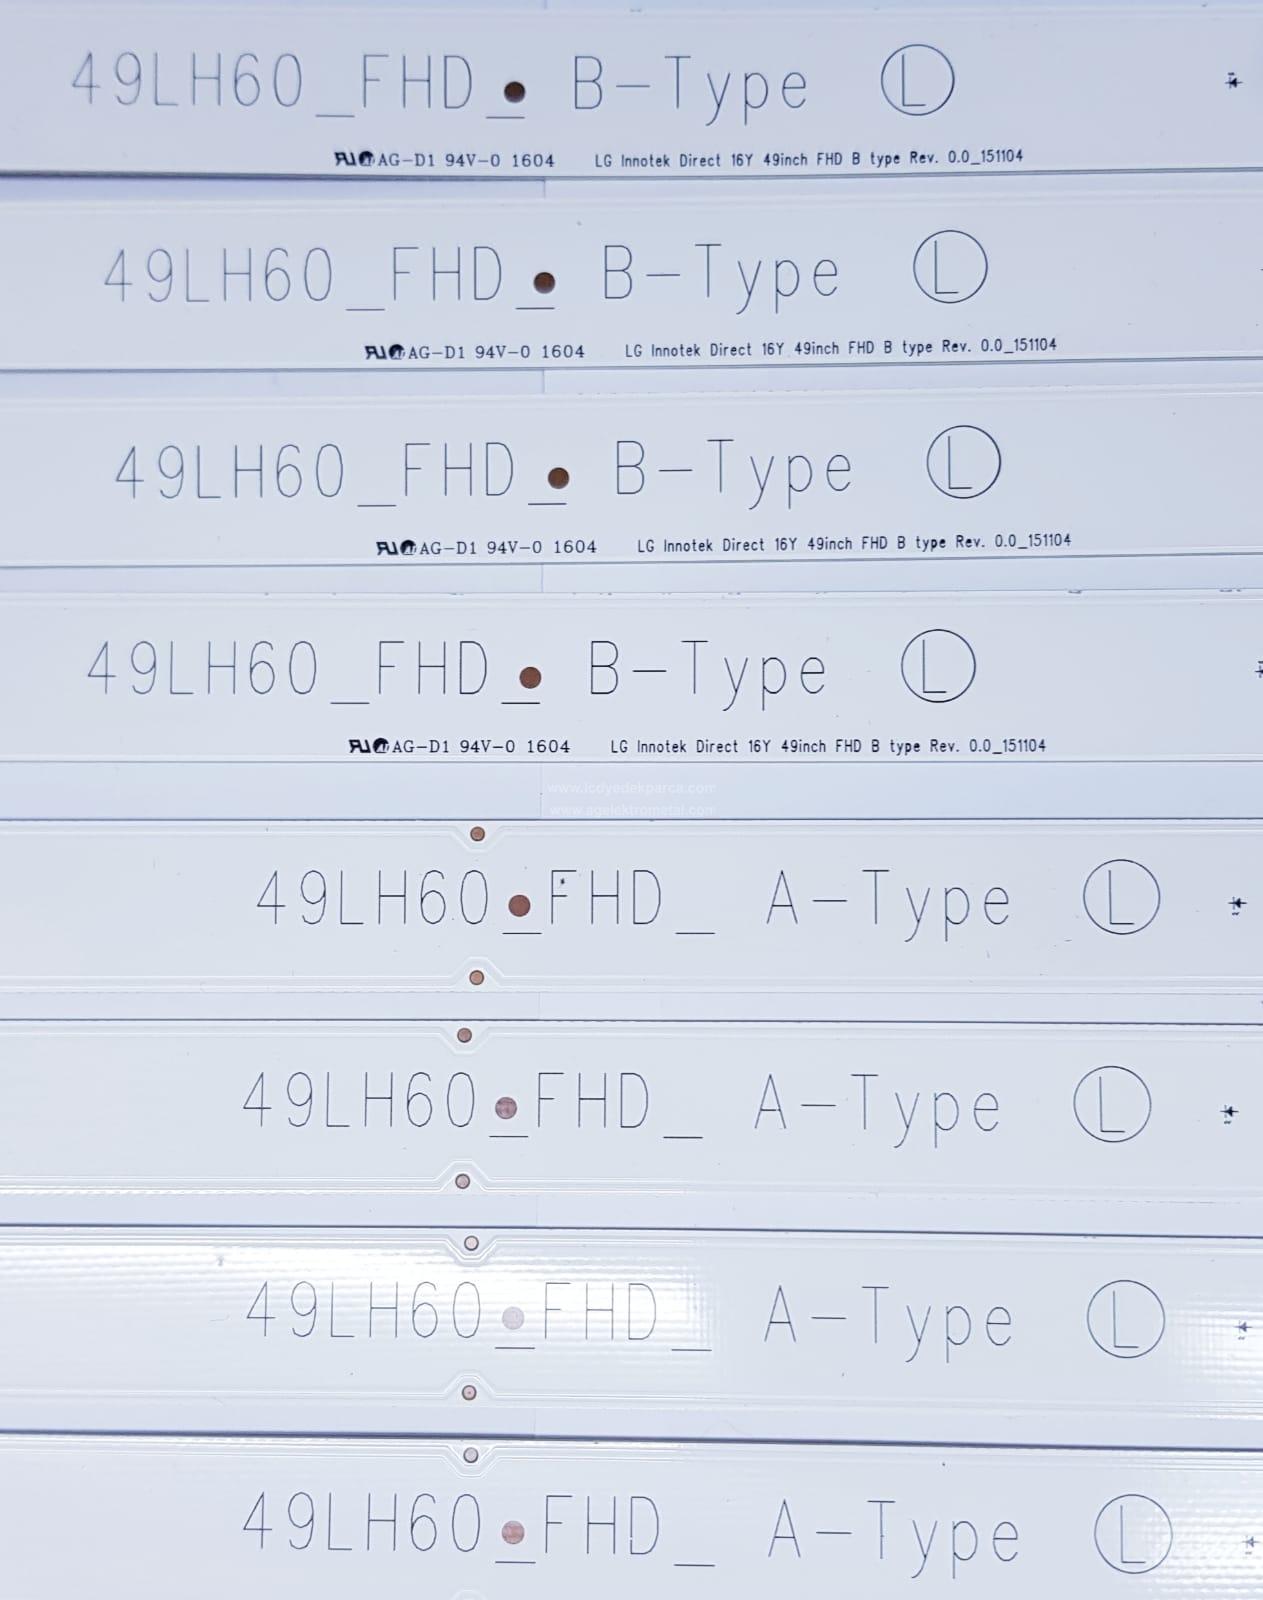 LG INNOTEK DIRECT 16Y 49 INCH FHD B TYPE REV.0.0_151104 , 49LH60_FHD_B_TYPE , LG INNOTEK DIRECT 16Y 49 INCH FHD A TYPE REV.0.0_151104 , 49LH60_FHD_A_TYPE , LG , 49LH604 , HC490DUN-ABRR1-211X EAJ63767701 , 8 ADET LED ÇUBUK